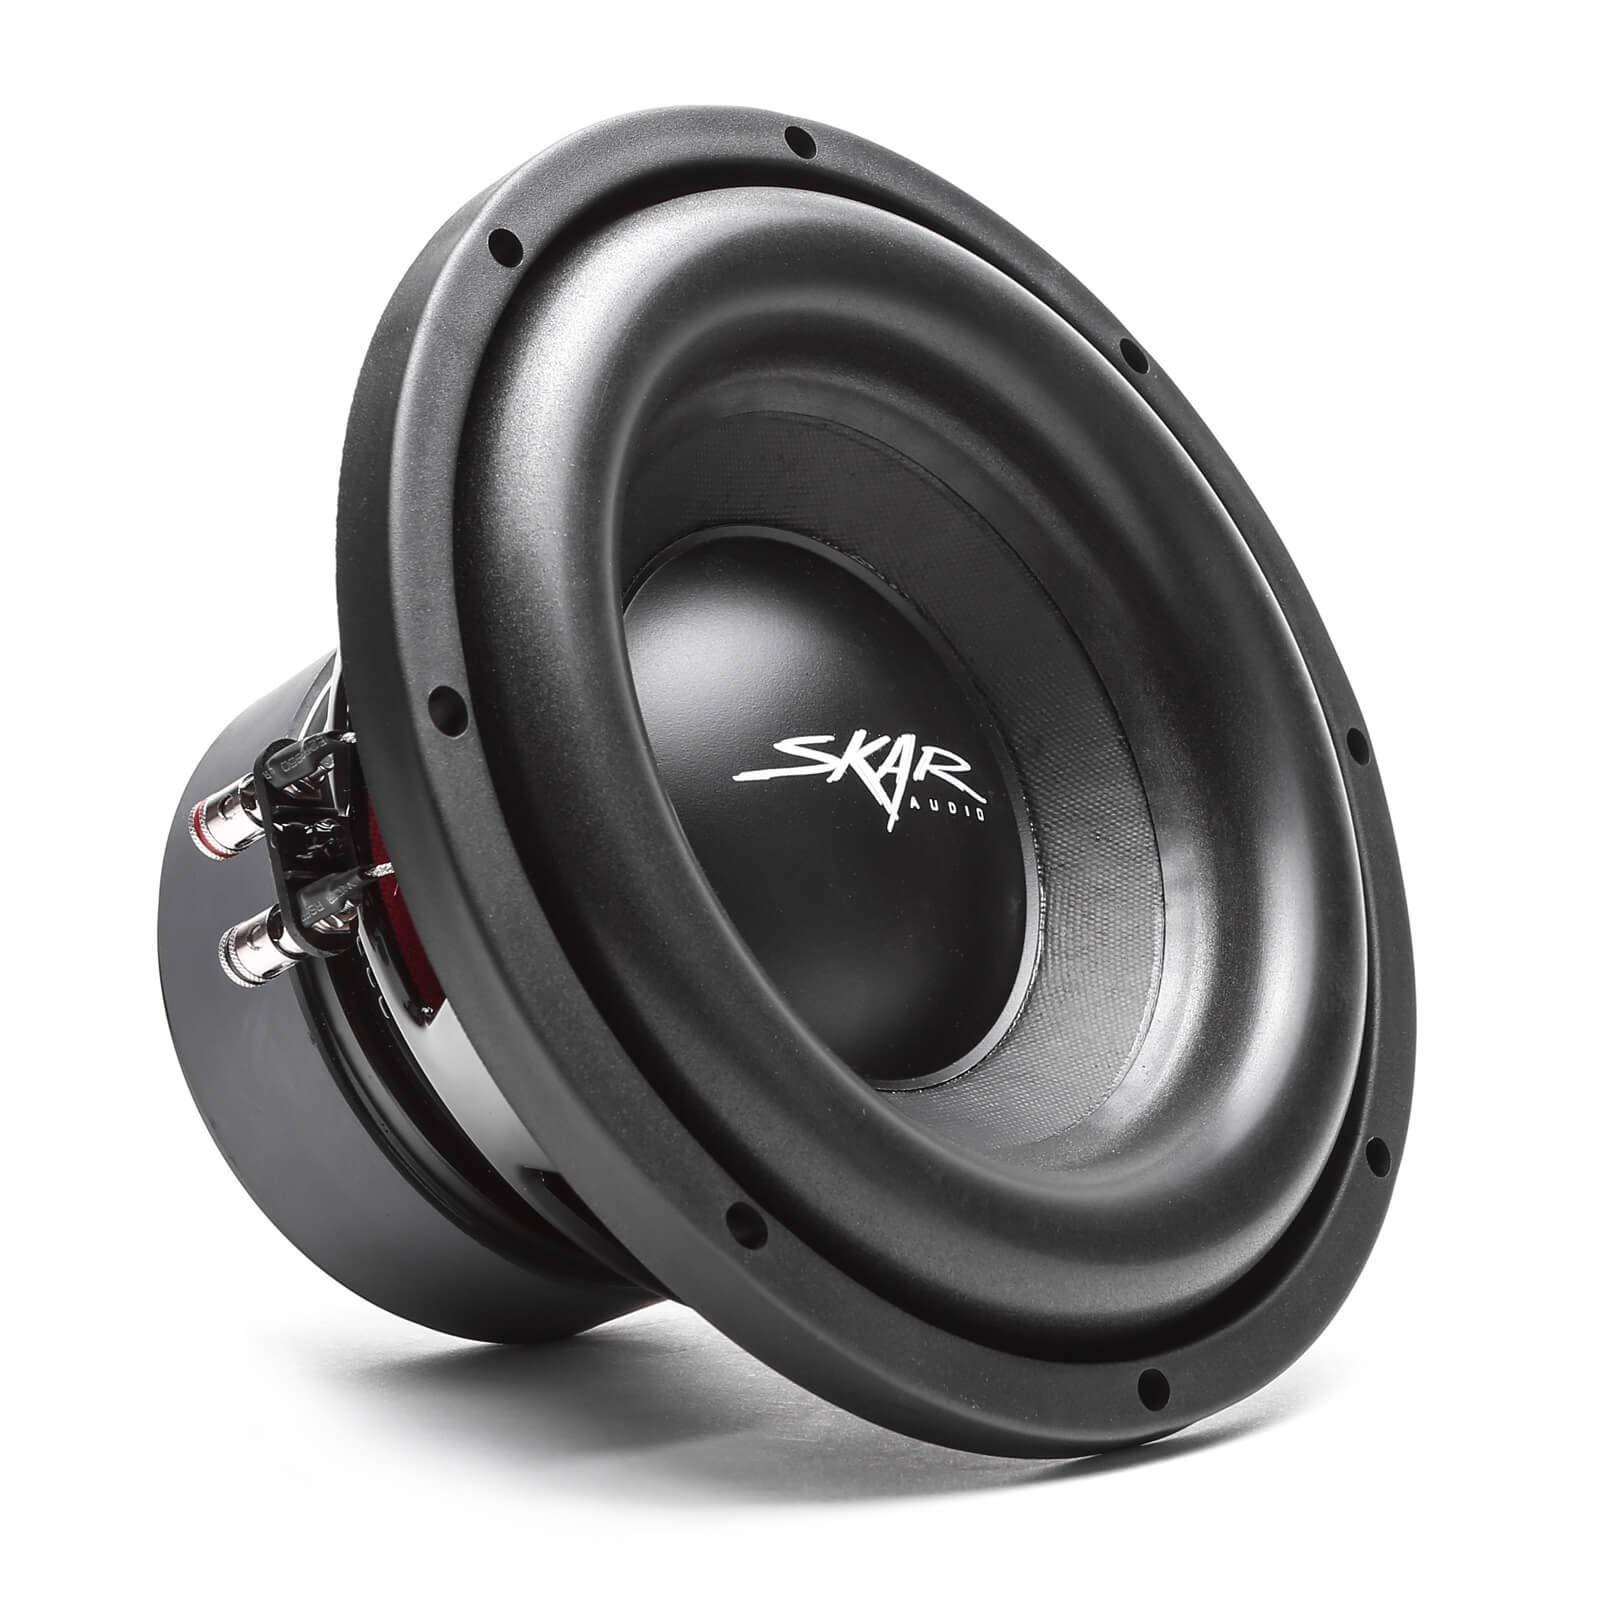 Skar Audio SDR-10 D4 10'' 1200 Watt Max Power Dual 4 Ohm Car Subwoofer by Skar Audio